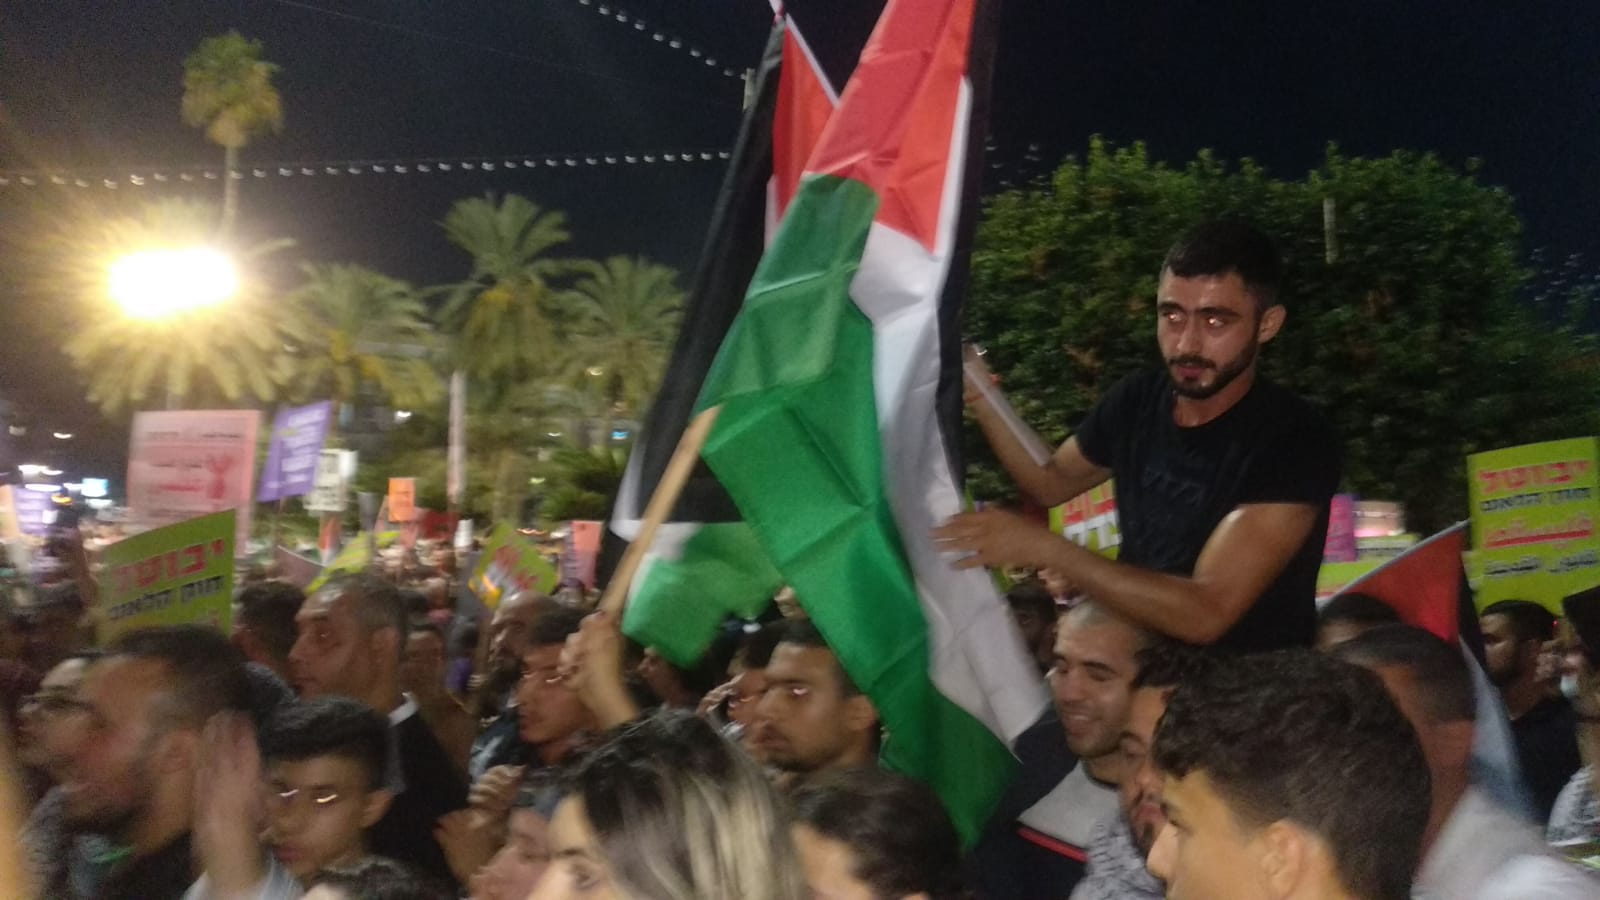 Photo of מצד אחד קוראים לביטול חוק הלאום ומצד שני מניפים דגלי פלסטין